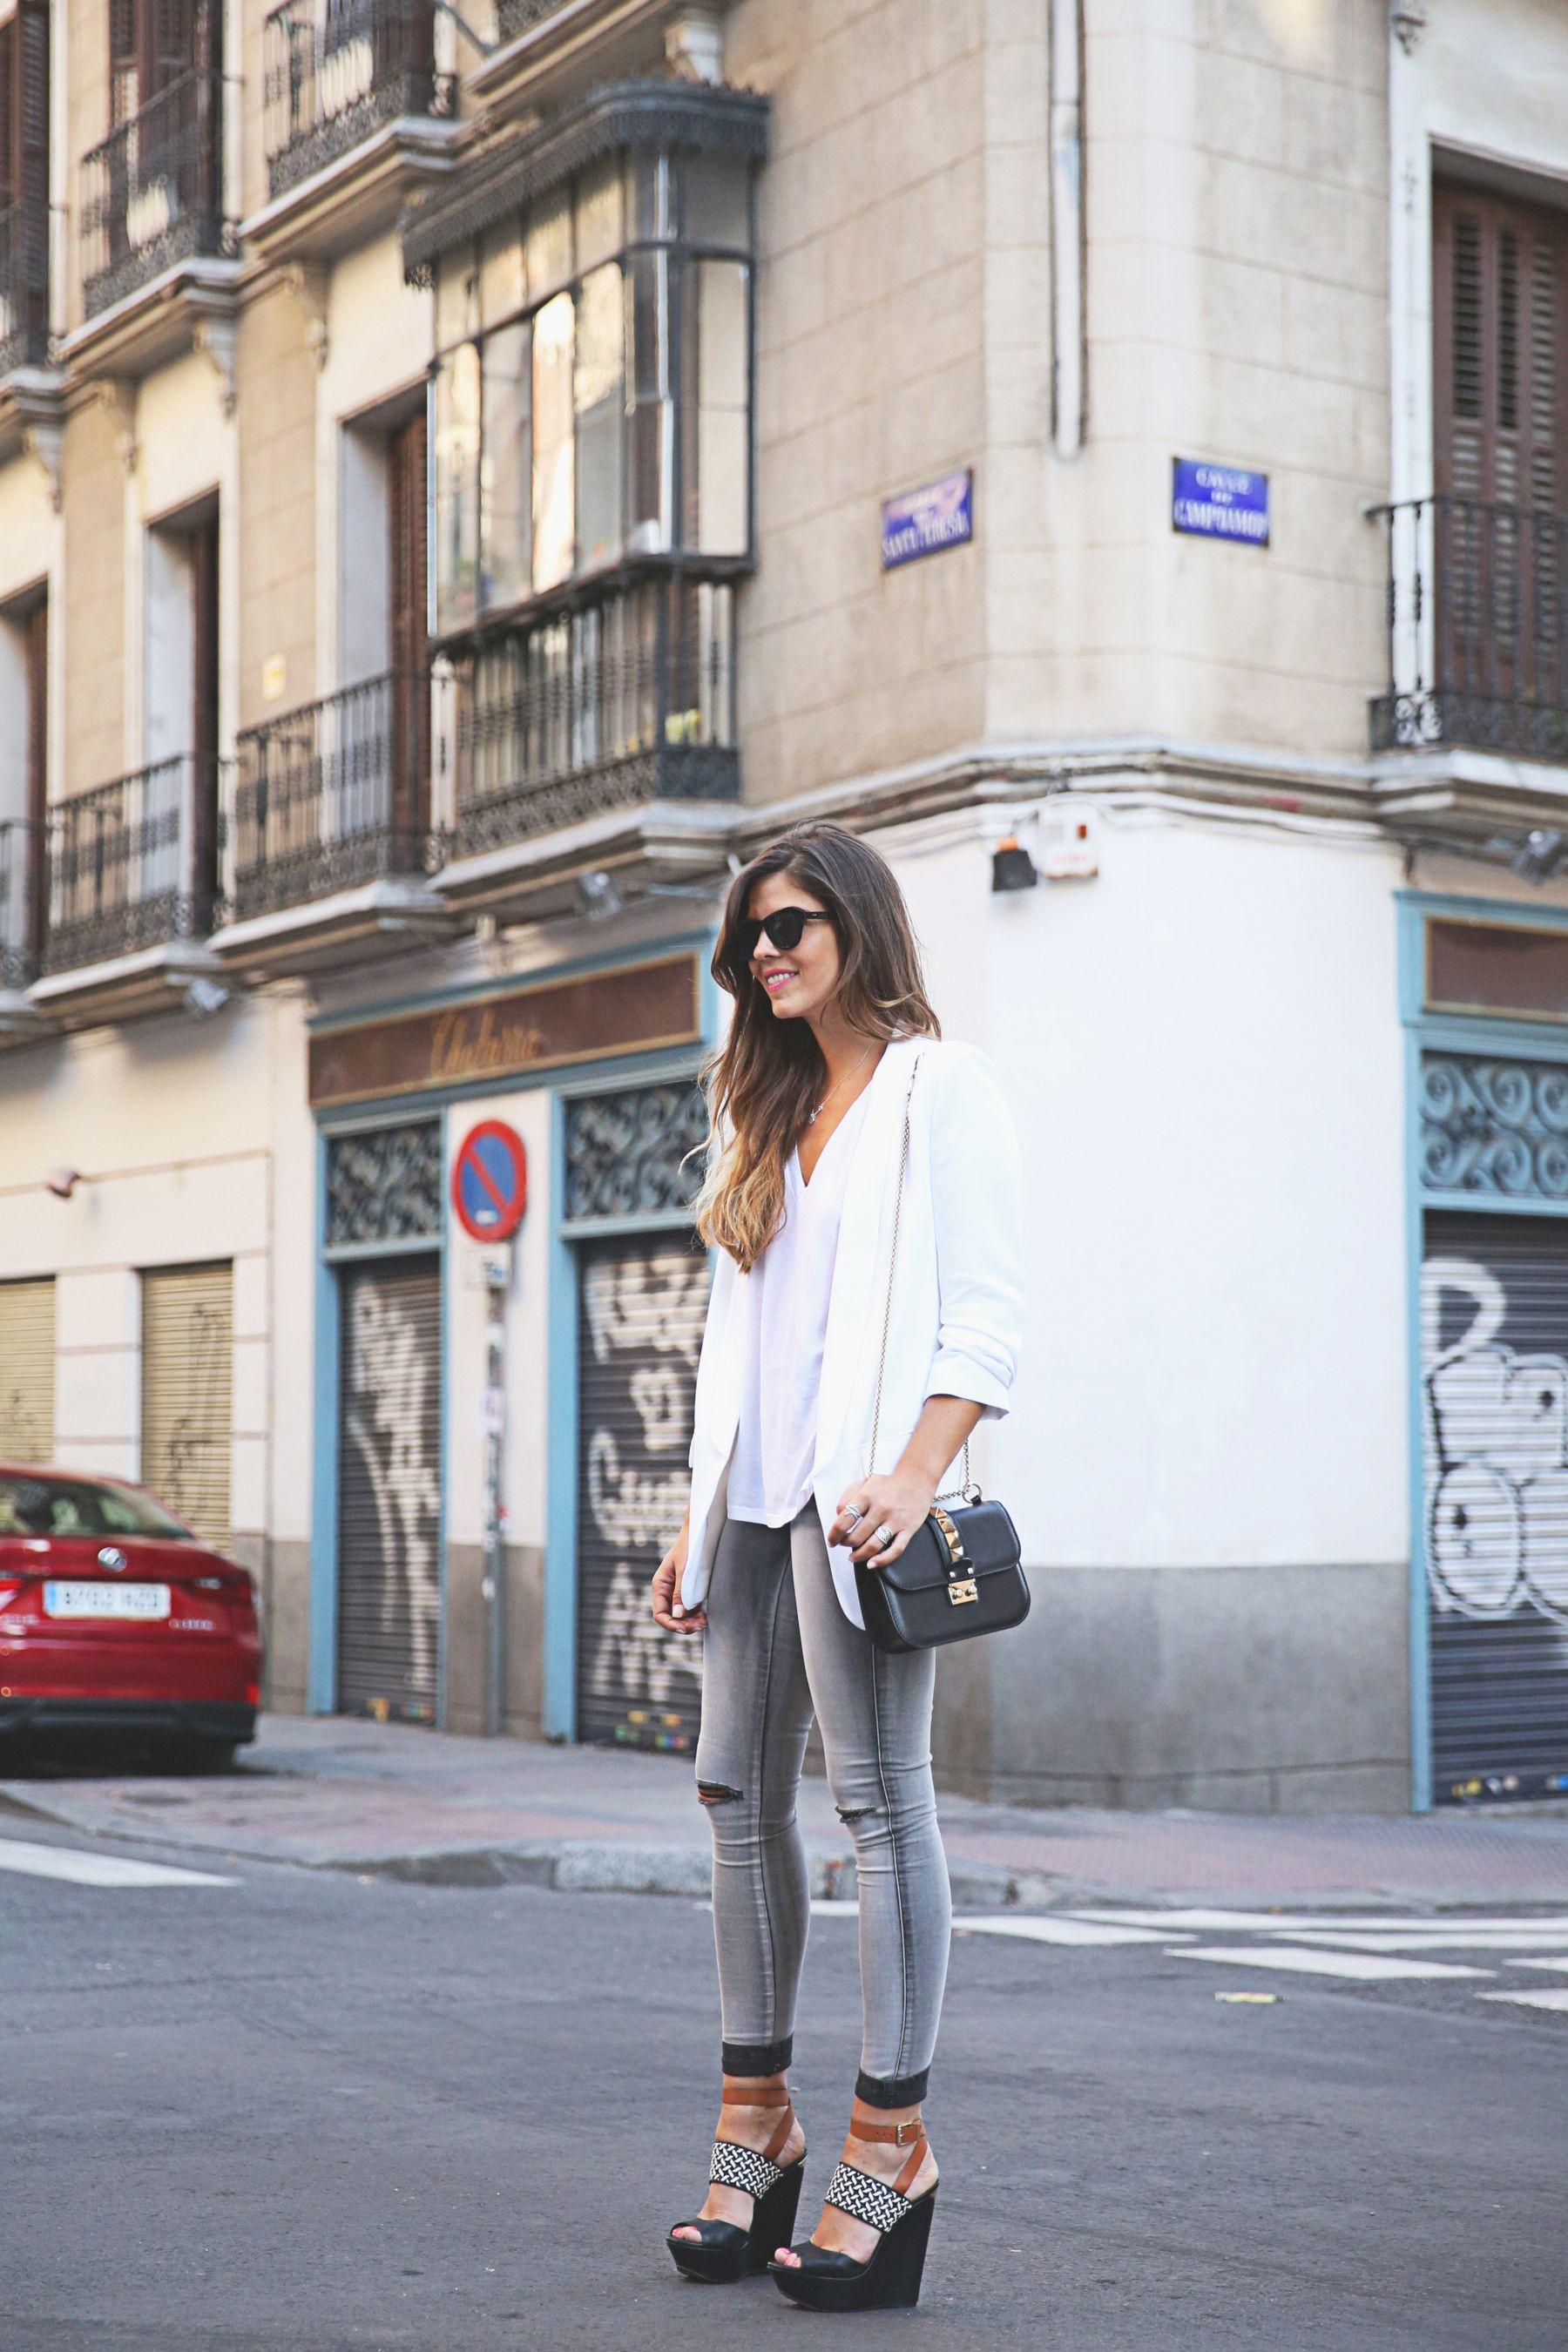 trendy-taste-look-outfit-street-style-ootd-blog-blogger-fashion-spain-moda-españa-SS15-verano2015-tendencias-trends-zara-buylevard-valentino-jessica-simpson-skinny-jeans-grey-white-blazer-americana-blanca-vaqueros-pitillo-sandalias-sandals-etnicas